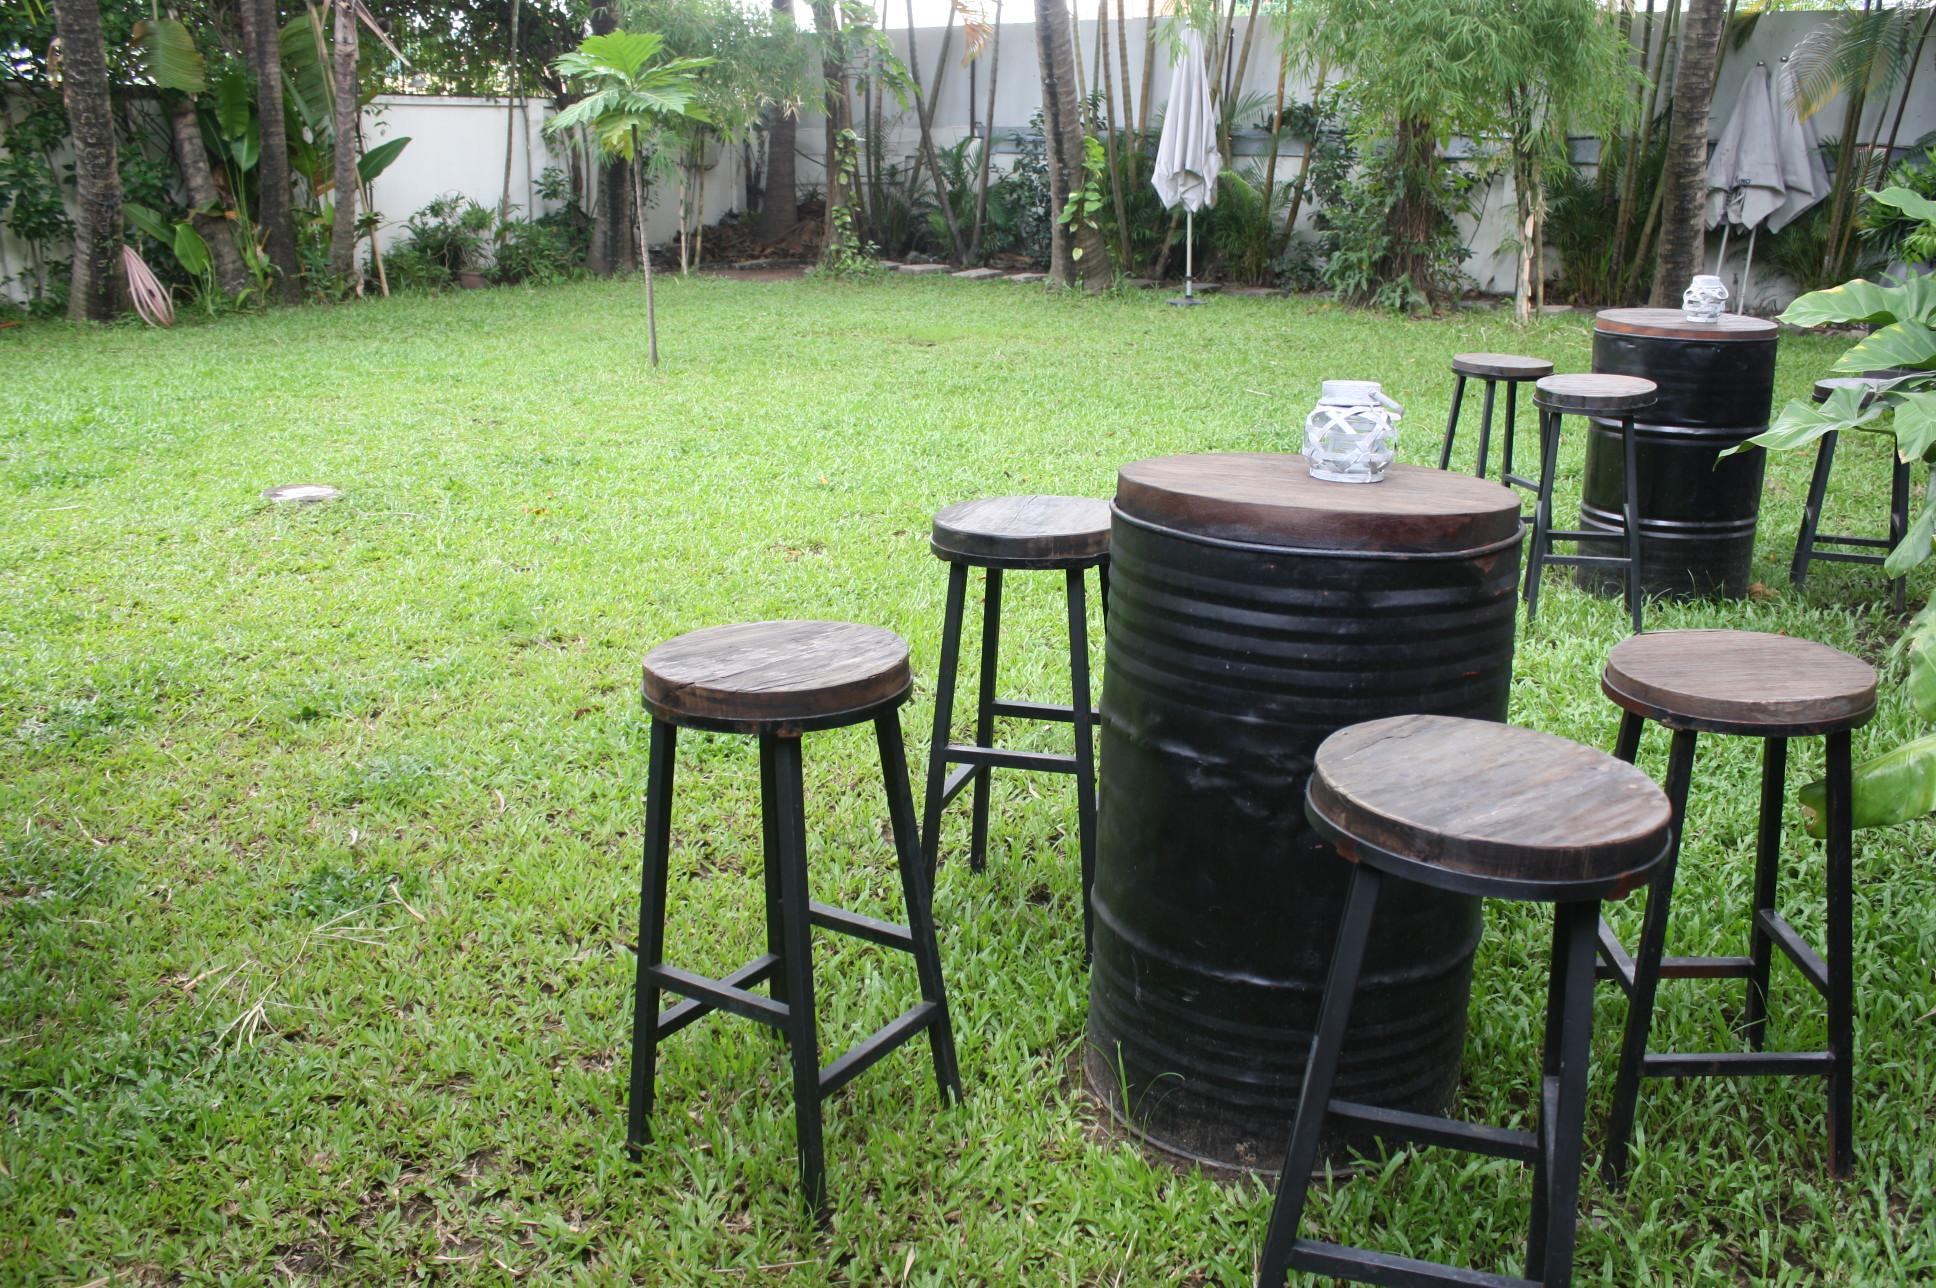 「MAD House」の芝生スペース